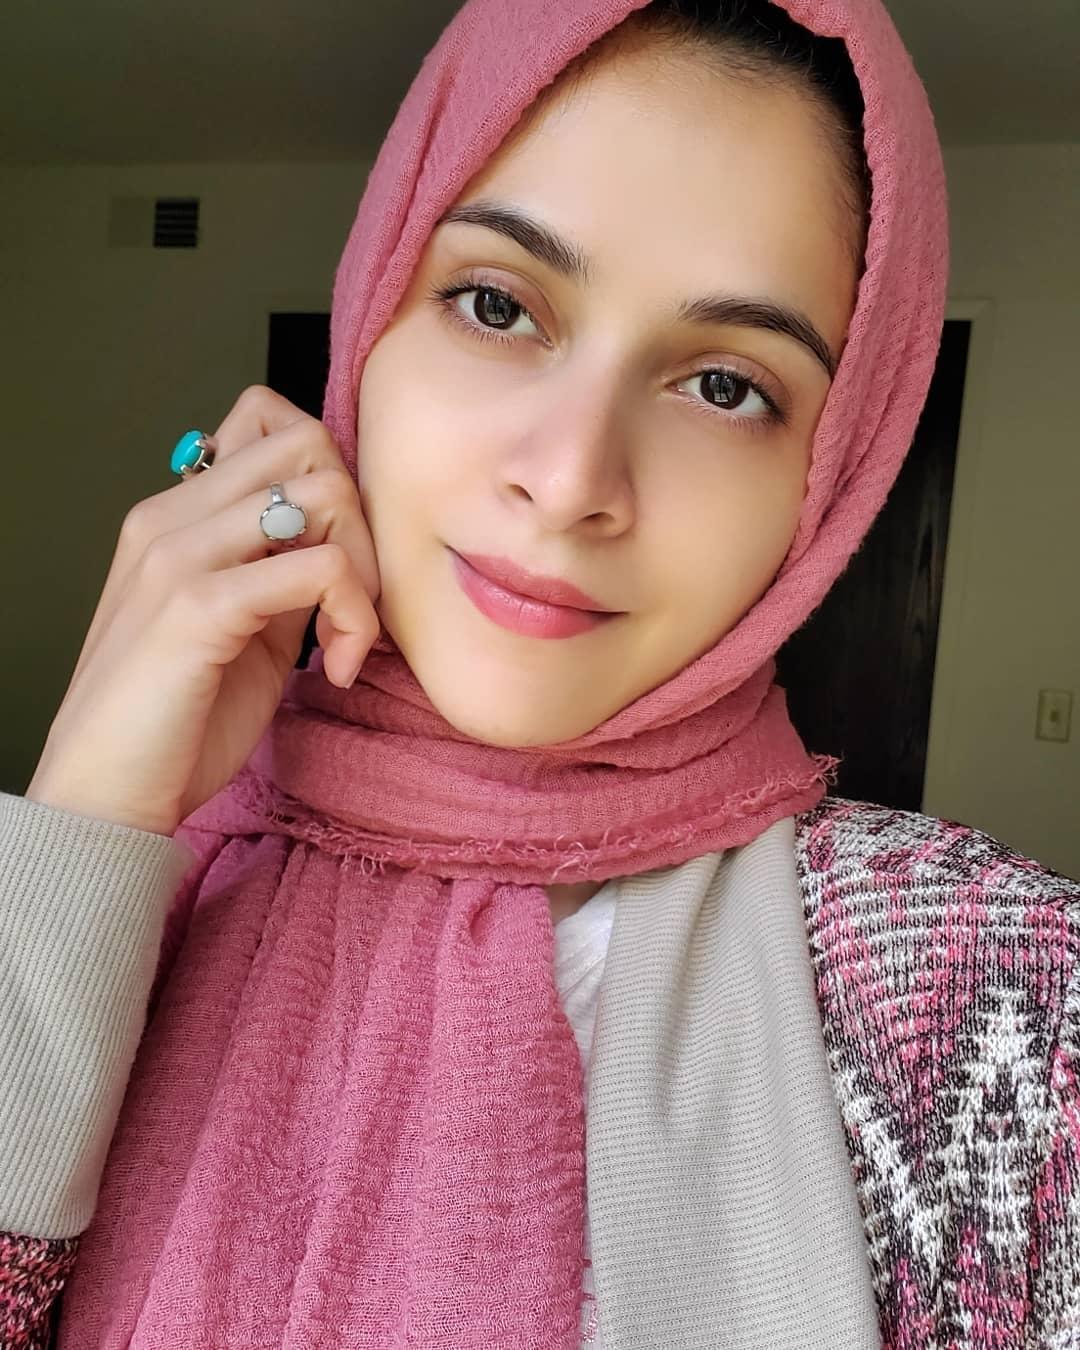 Beautiful Arij Fatima Pictures from Canada